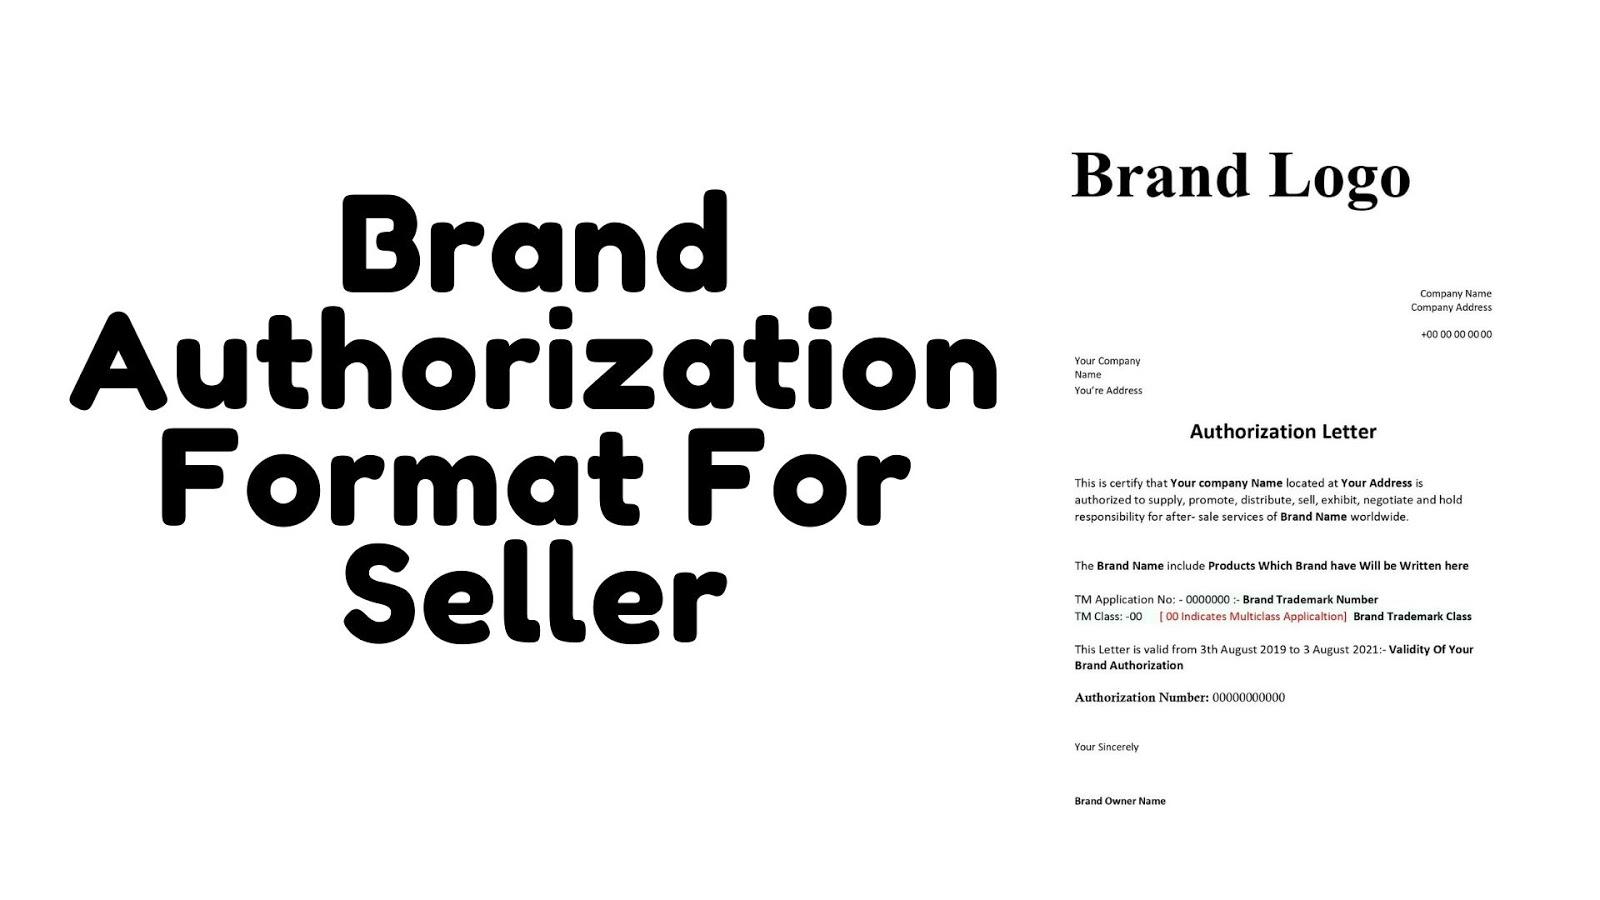 Brand Authorization Letter Sample from 1.bp.blogspot.com